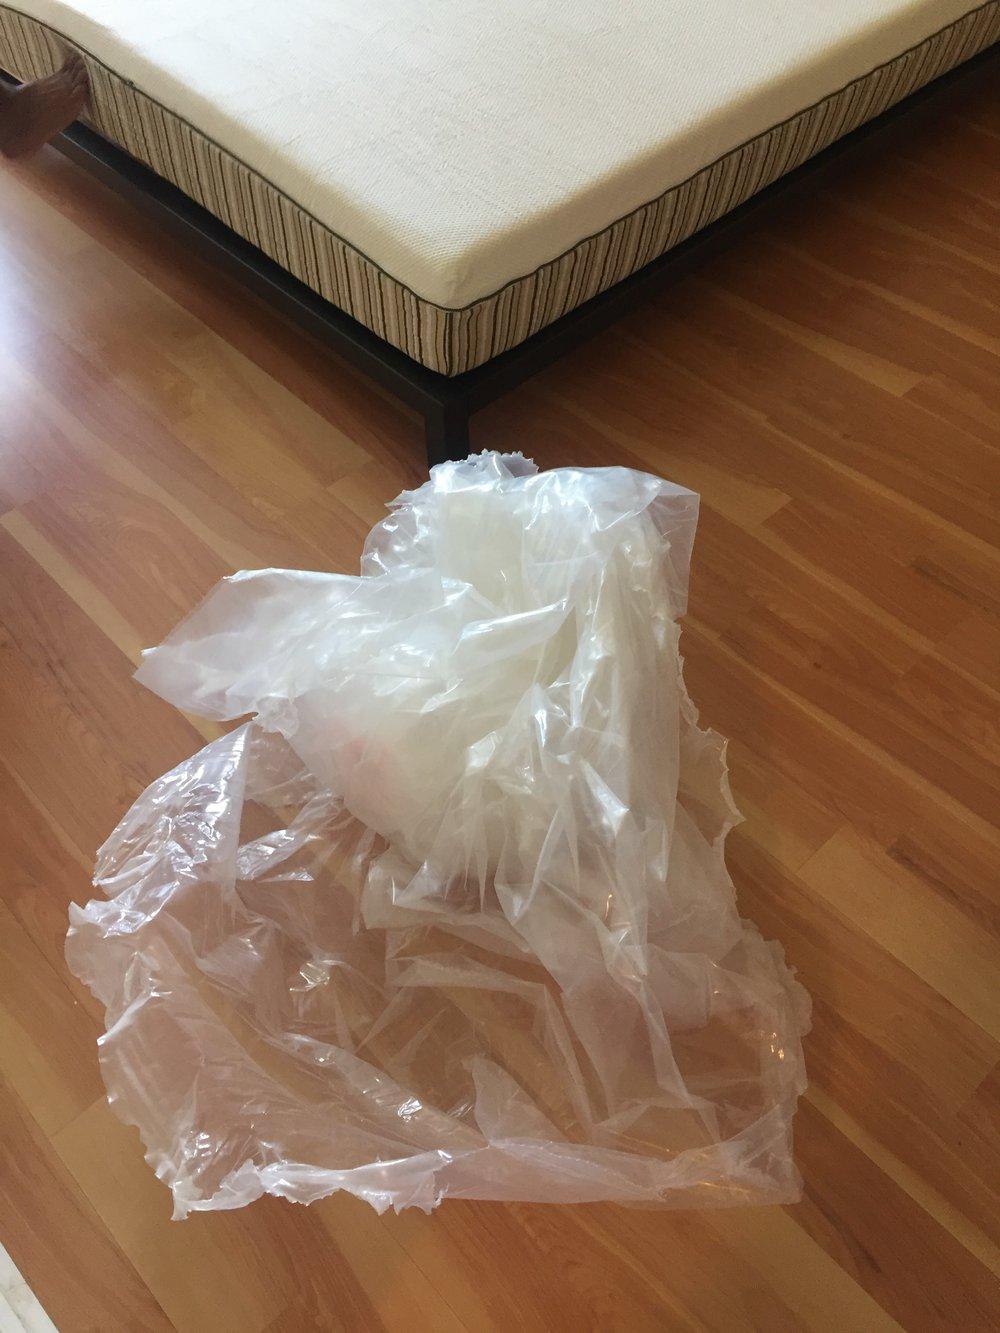 Plastic which covered the Essentia mattress.